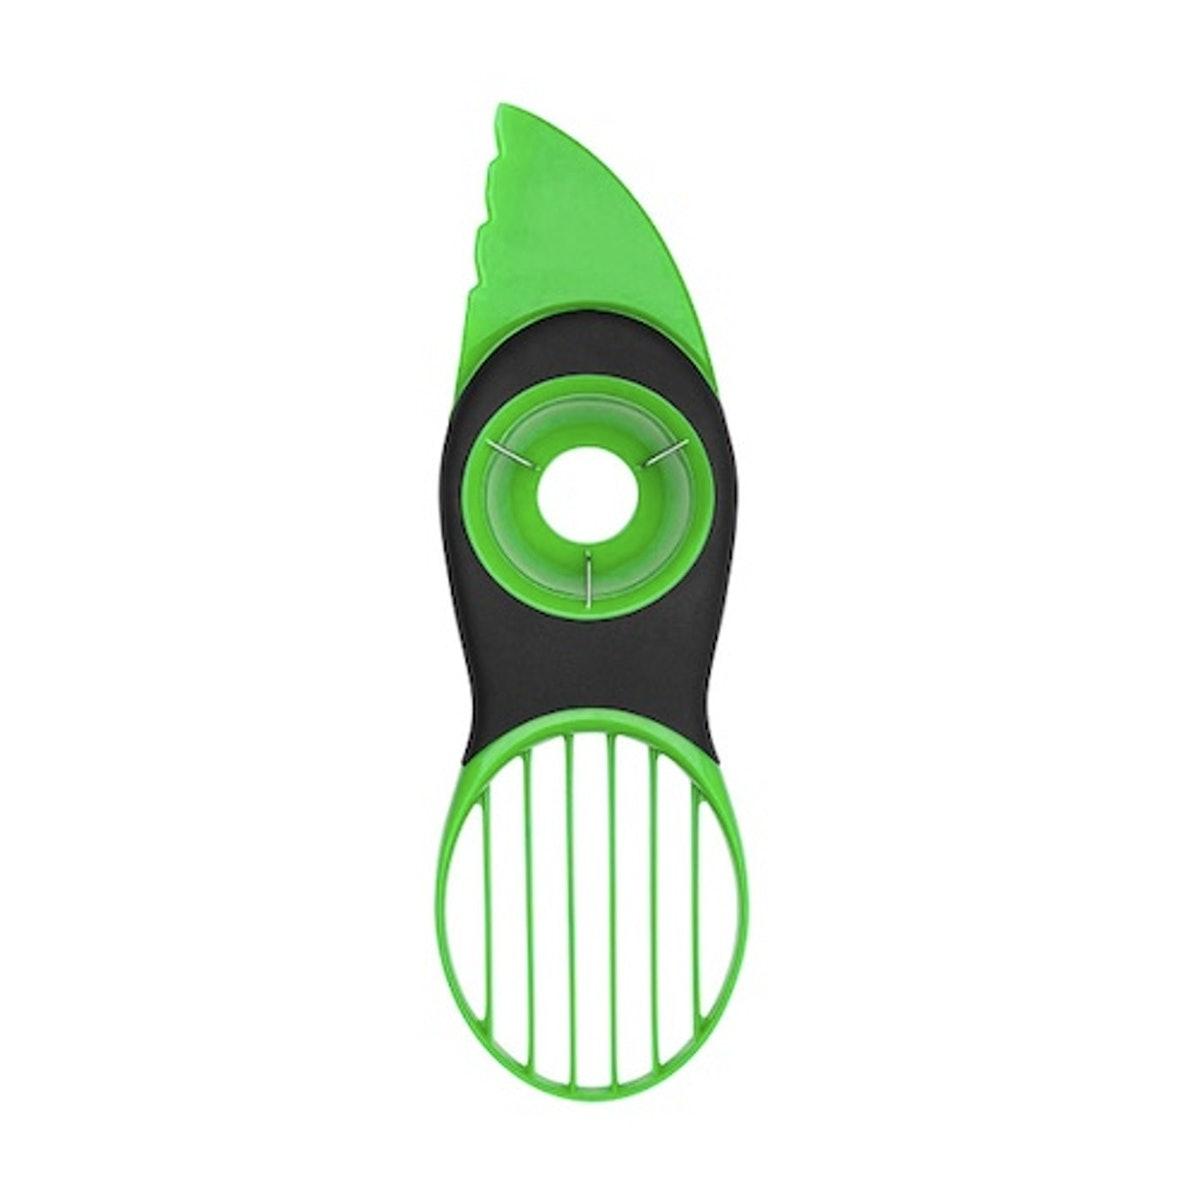 OXO Good Grips 3-In-1 Avocado Knife